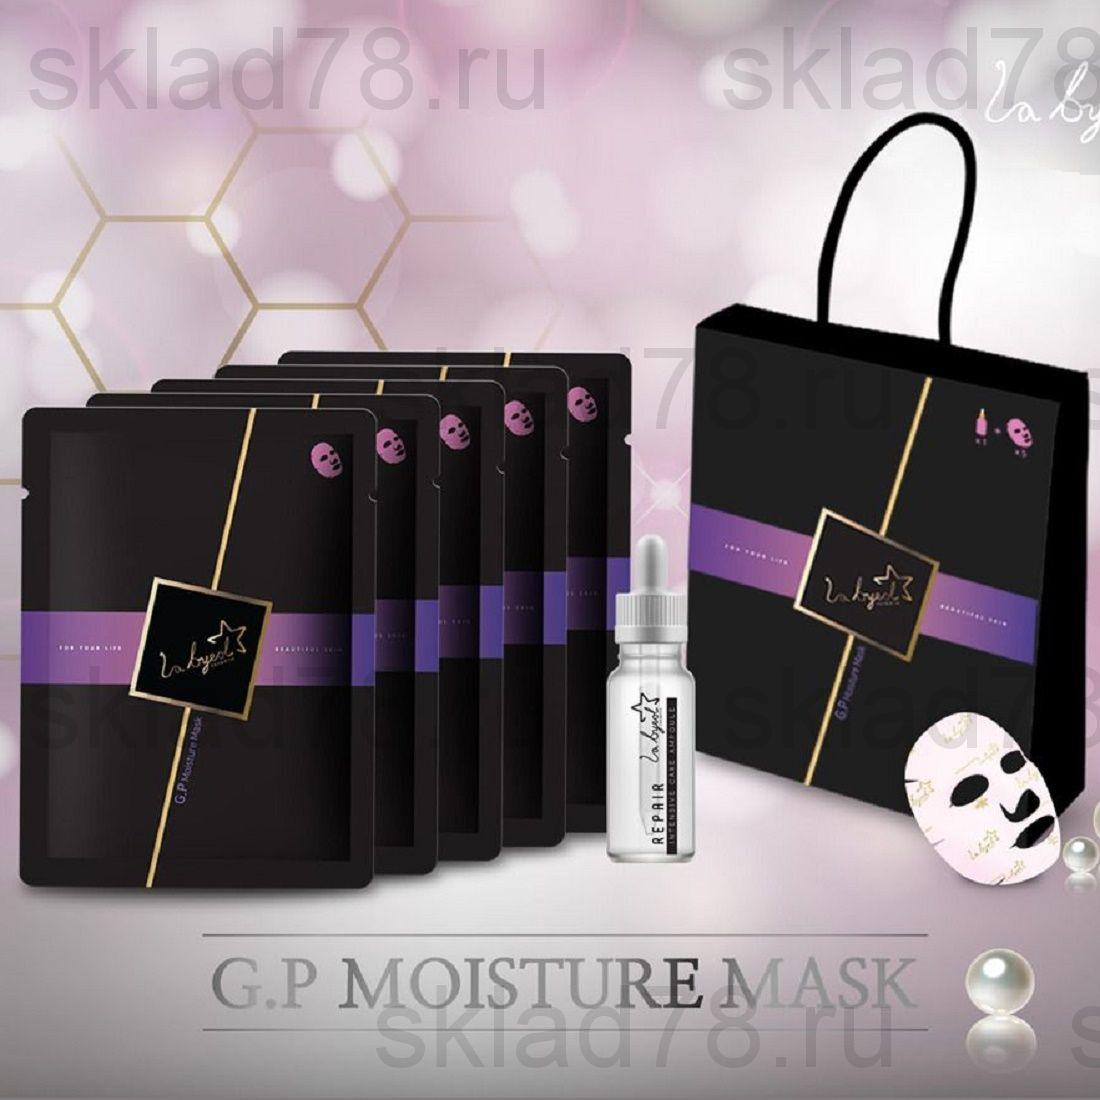 G.P Moisture Mask – увлажняющая маска